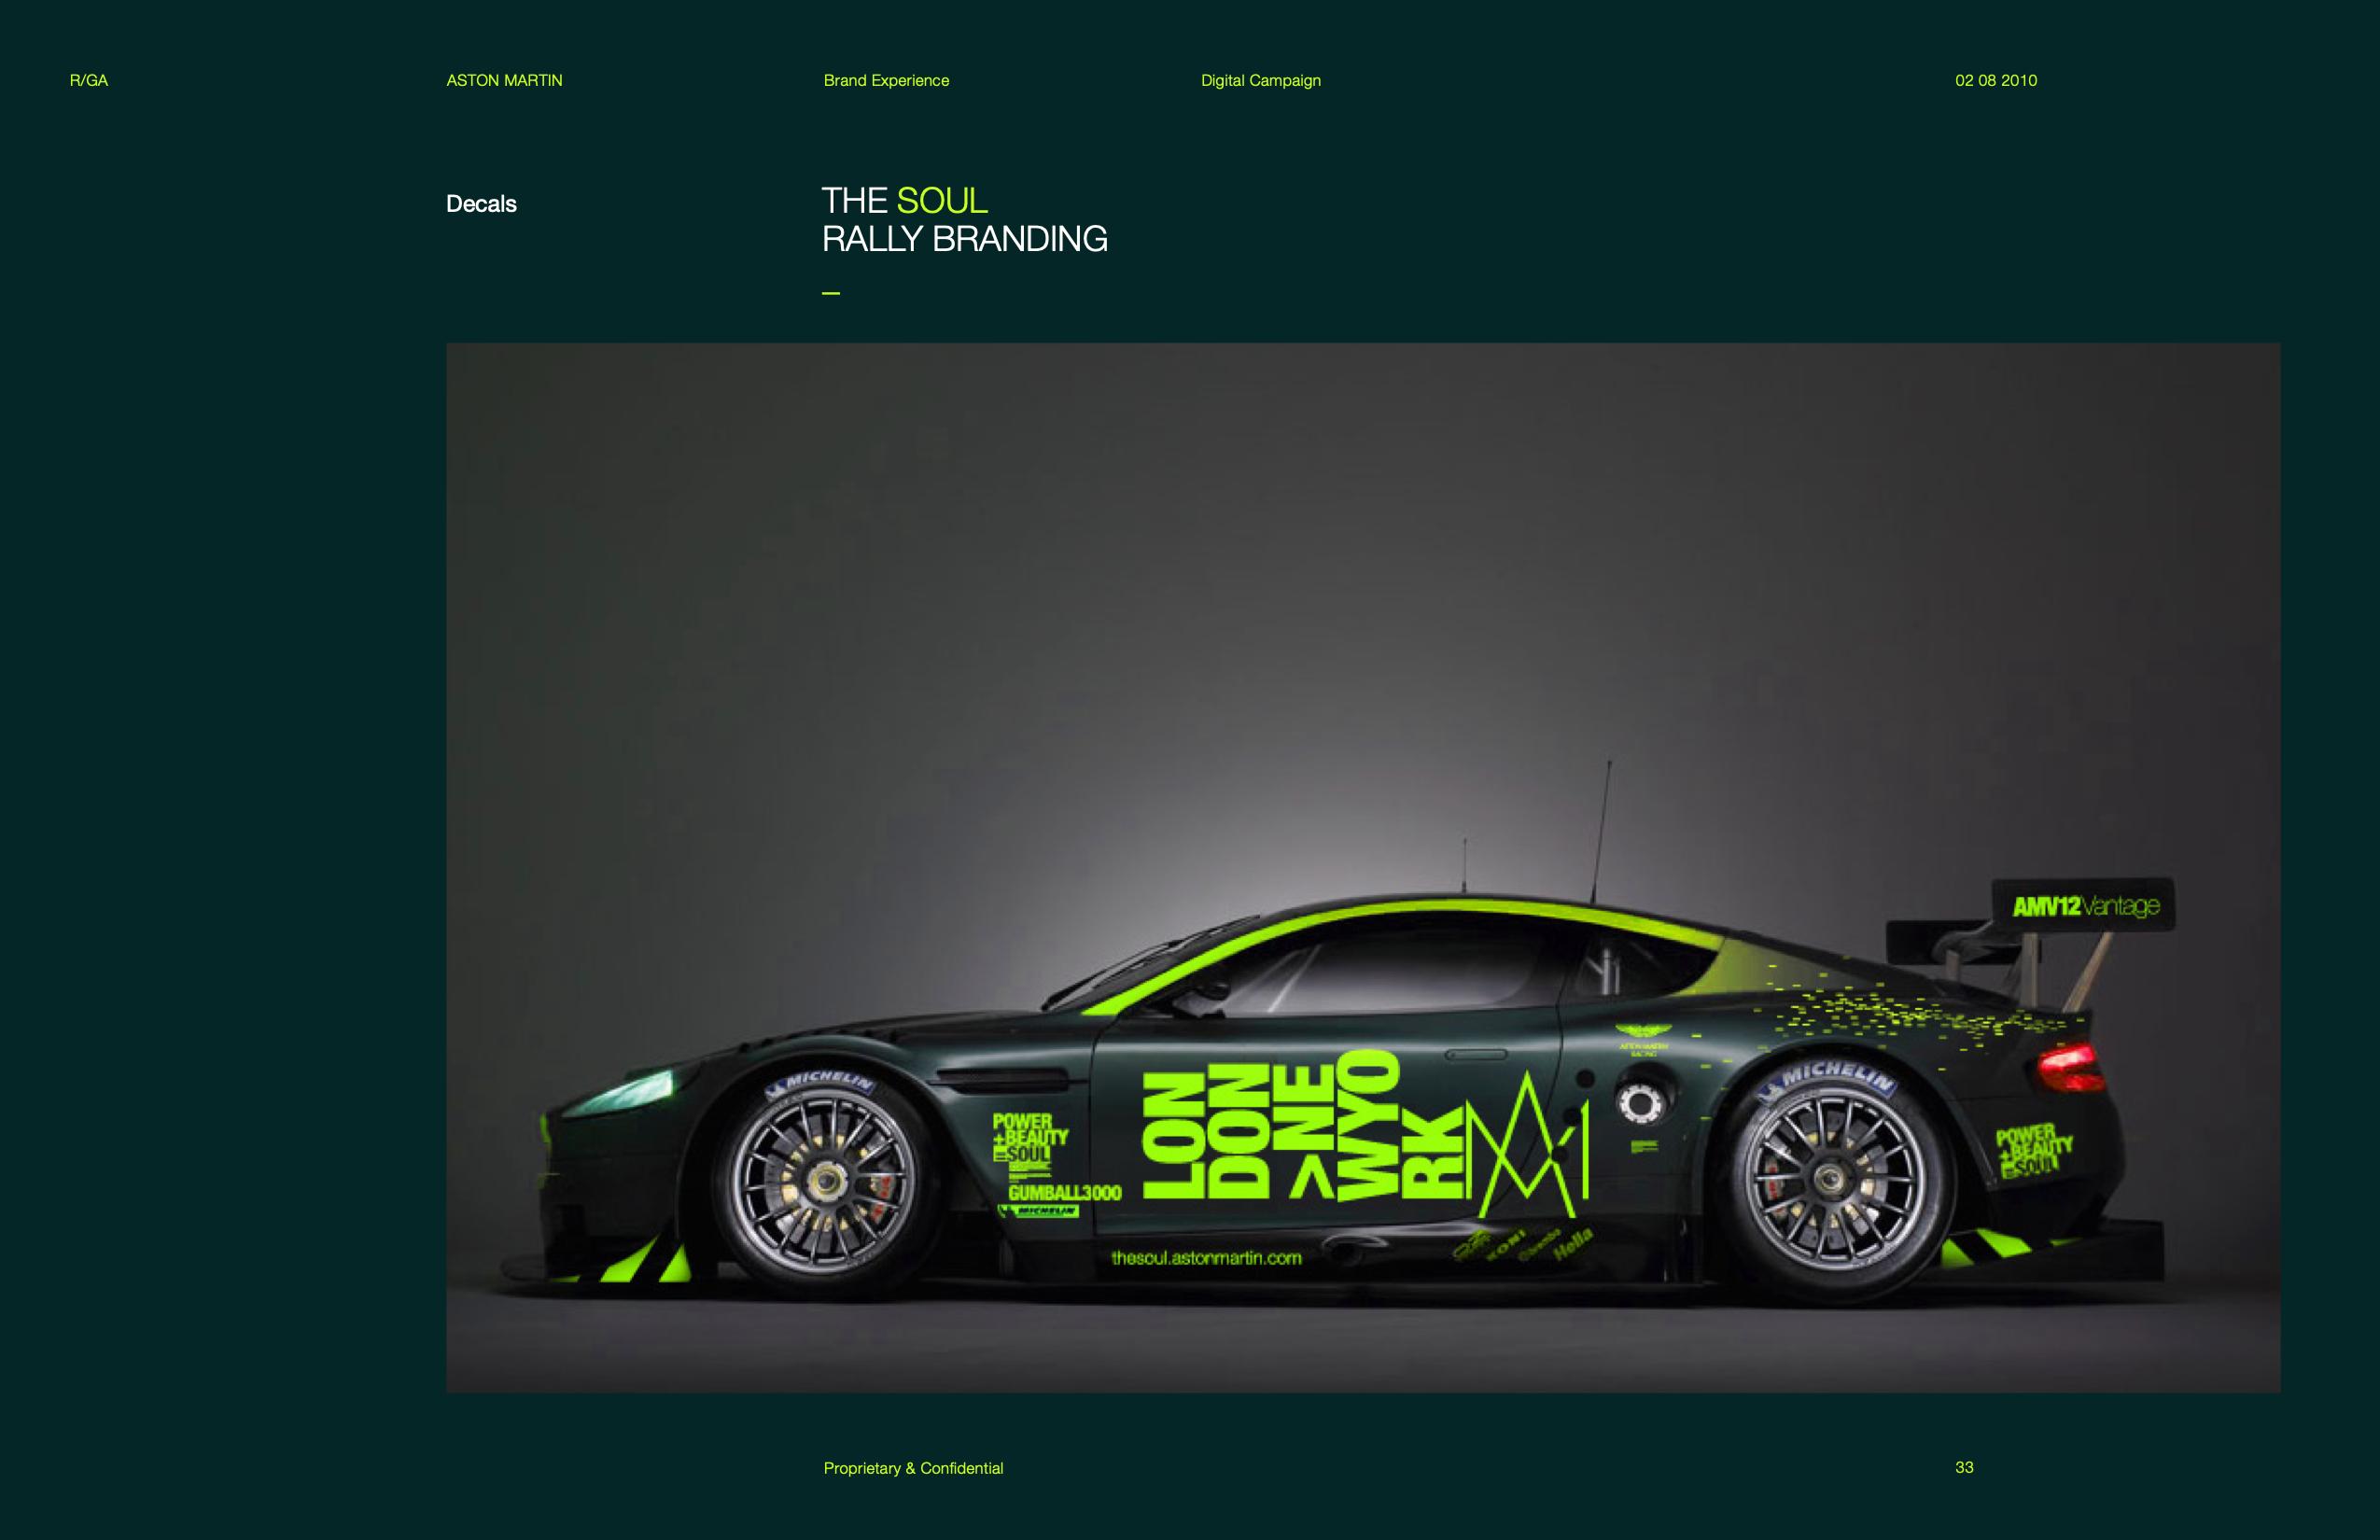 Aston Martin Brand Interface